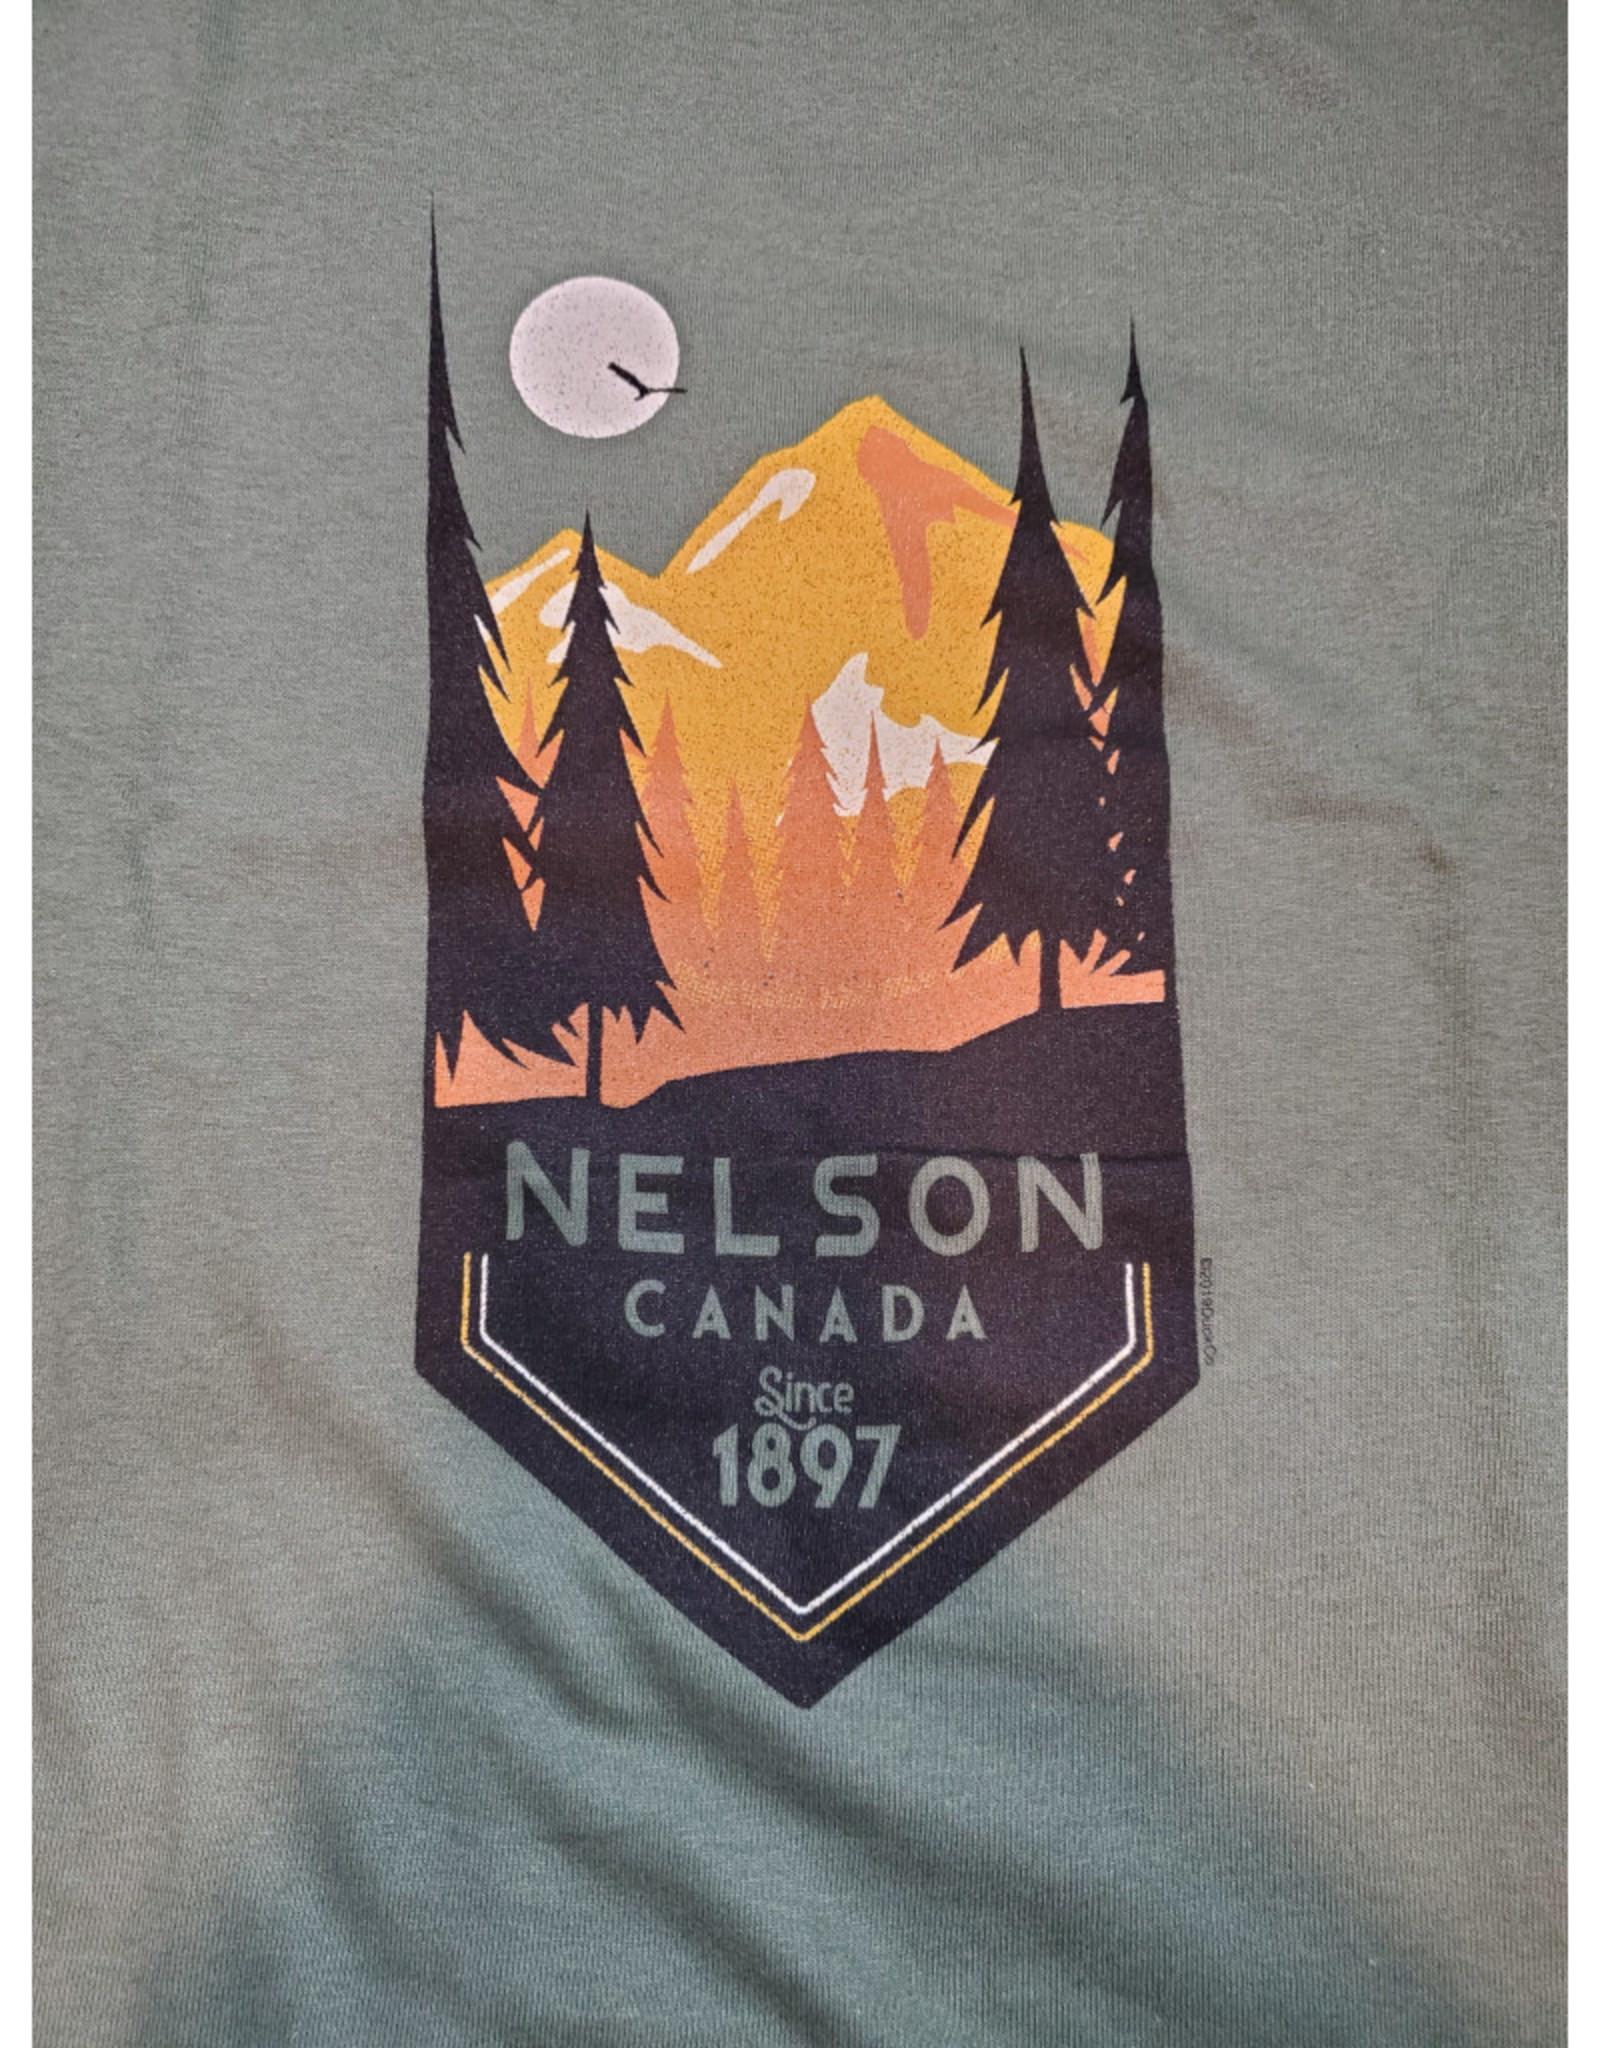 Nelson Souvenir Tee - Vantage Point